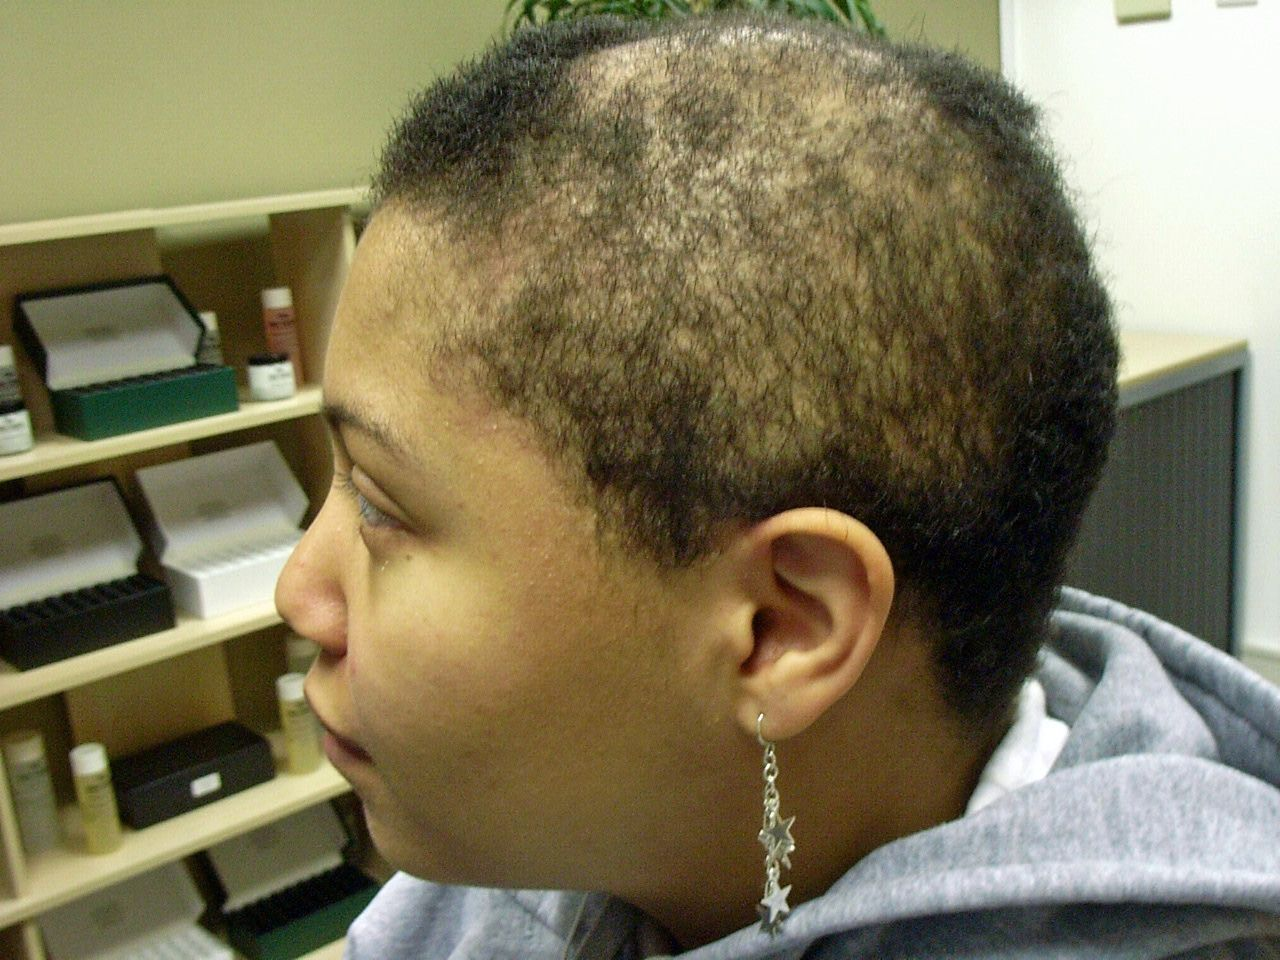 Alopecia Hair Styles: Alopecia Hair Loss Treatment *** For More Information